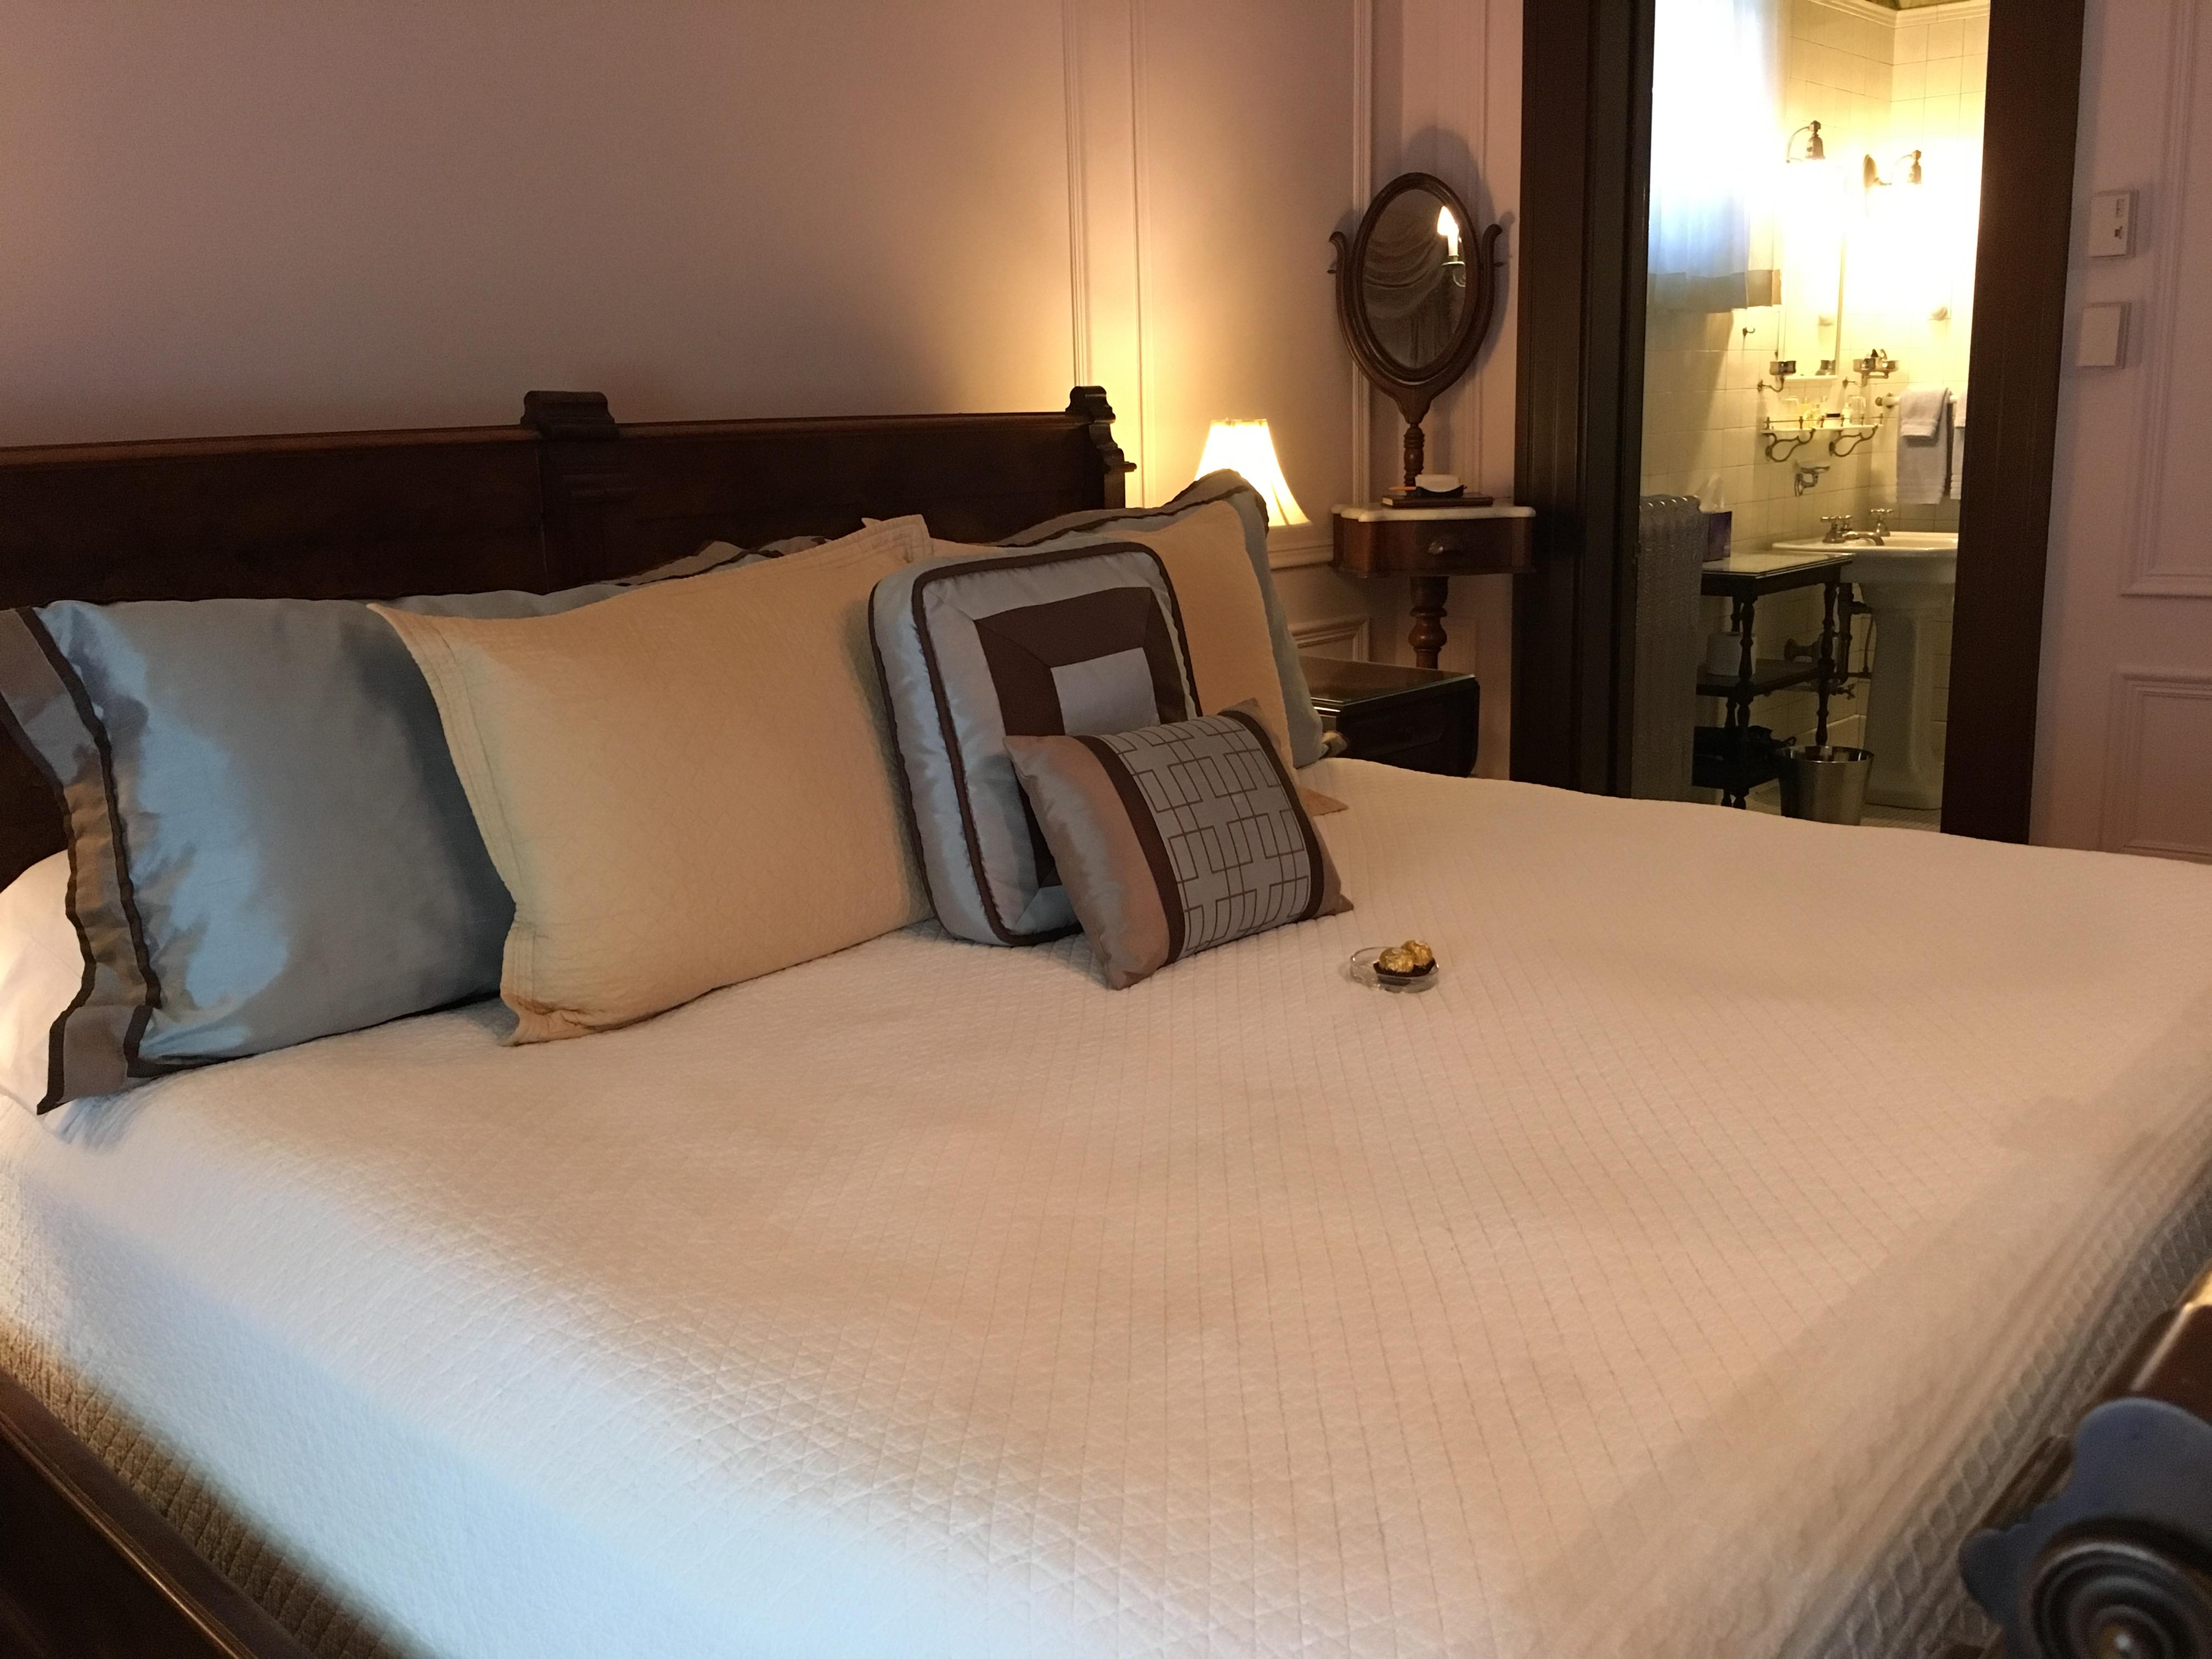 Josepg bed